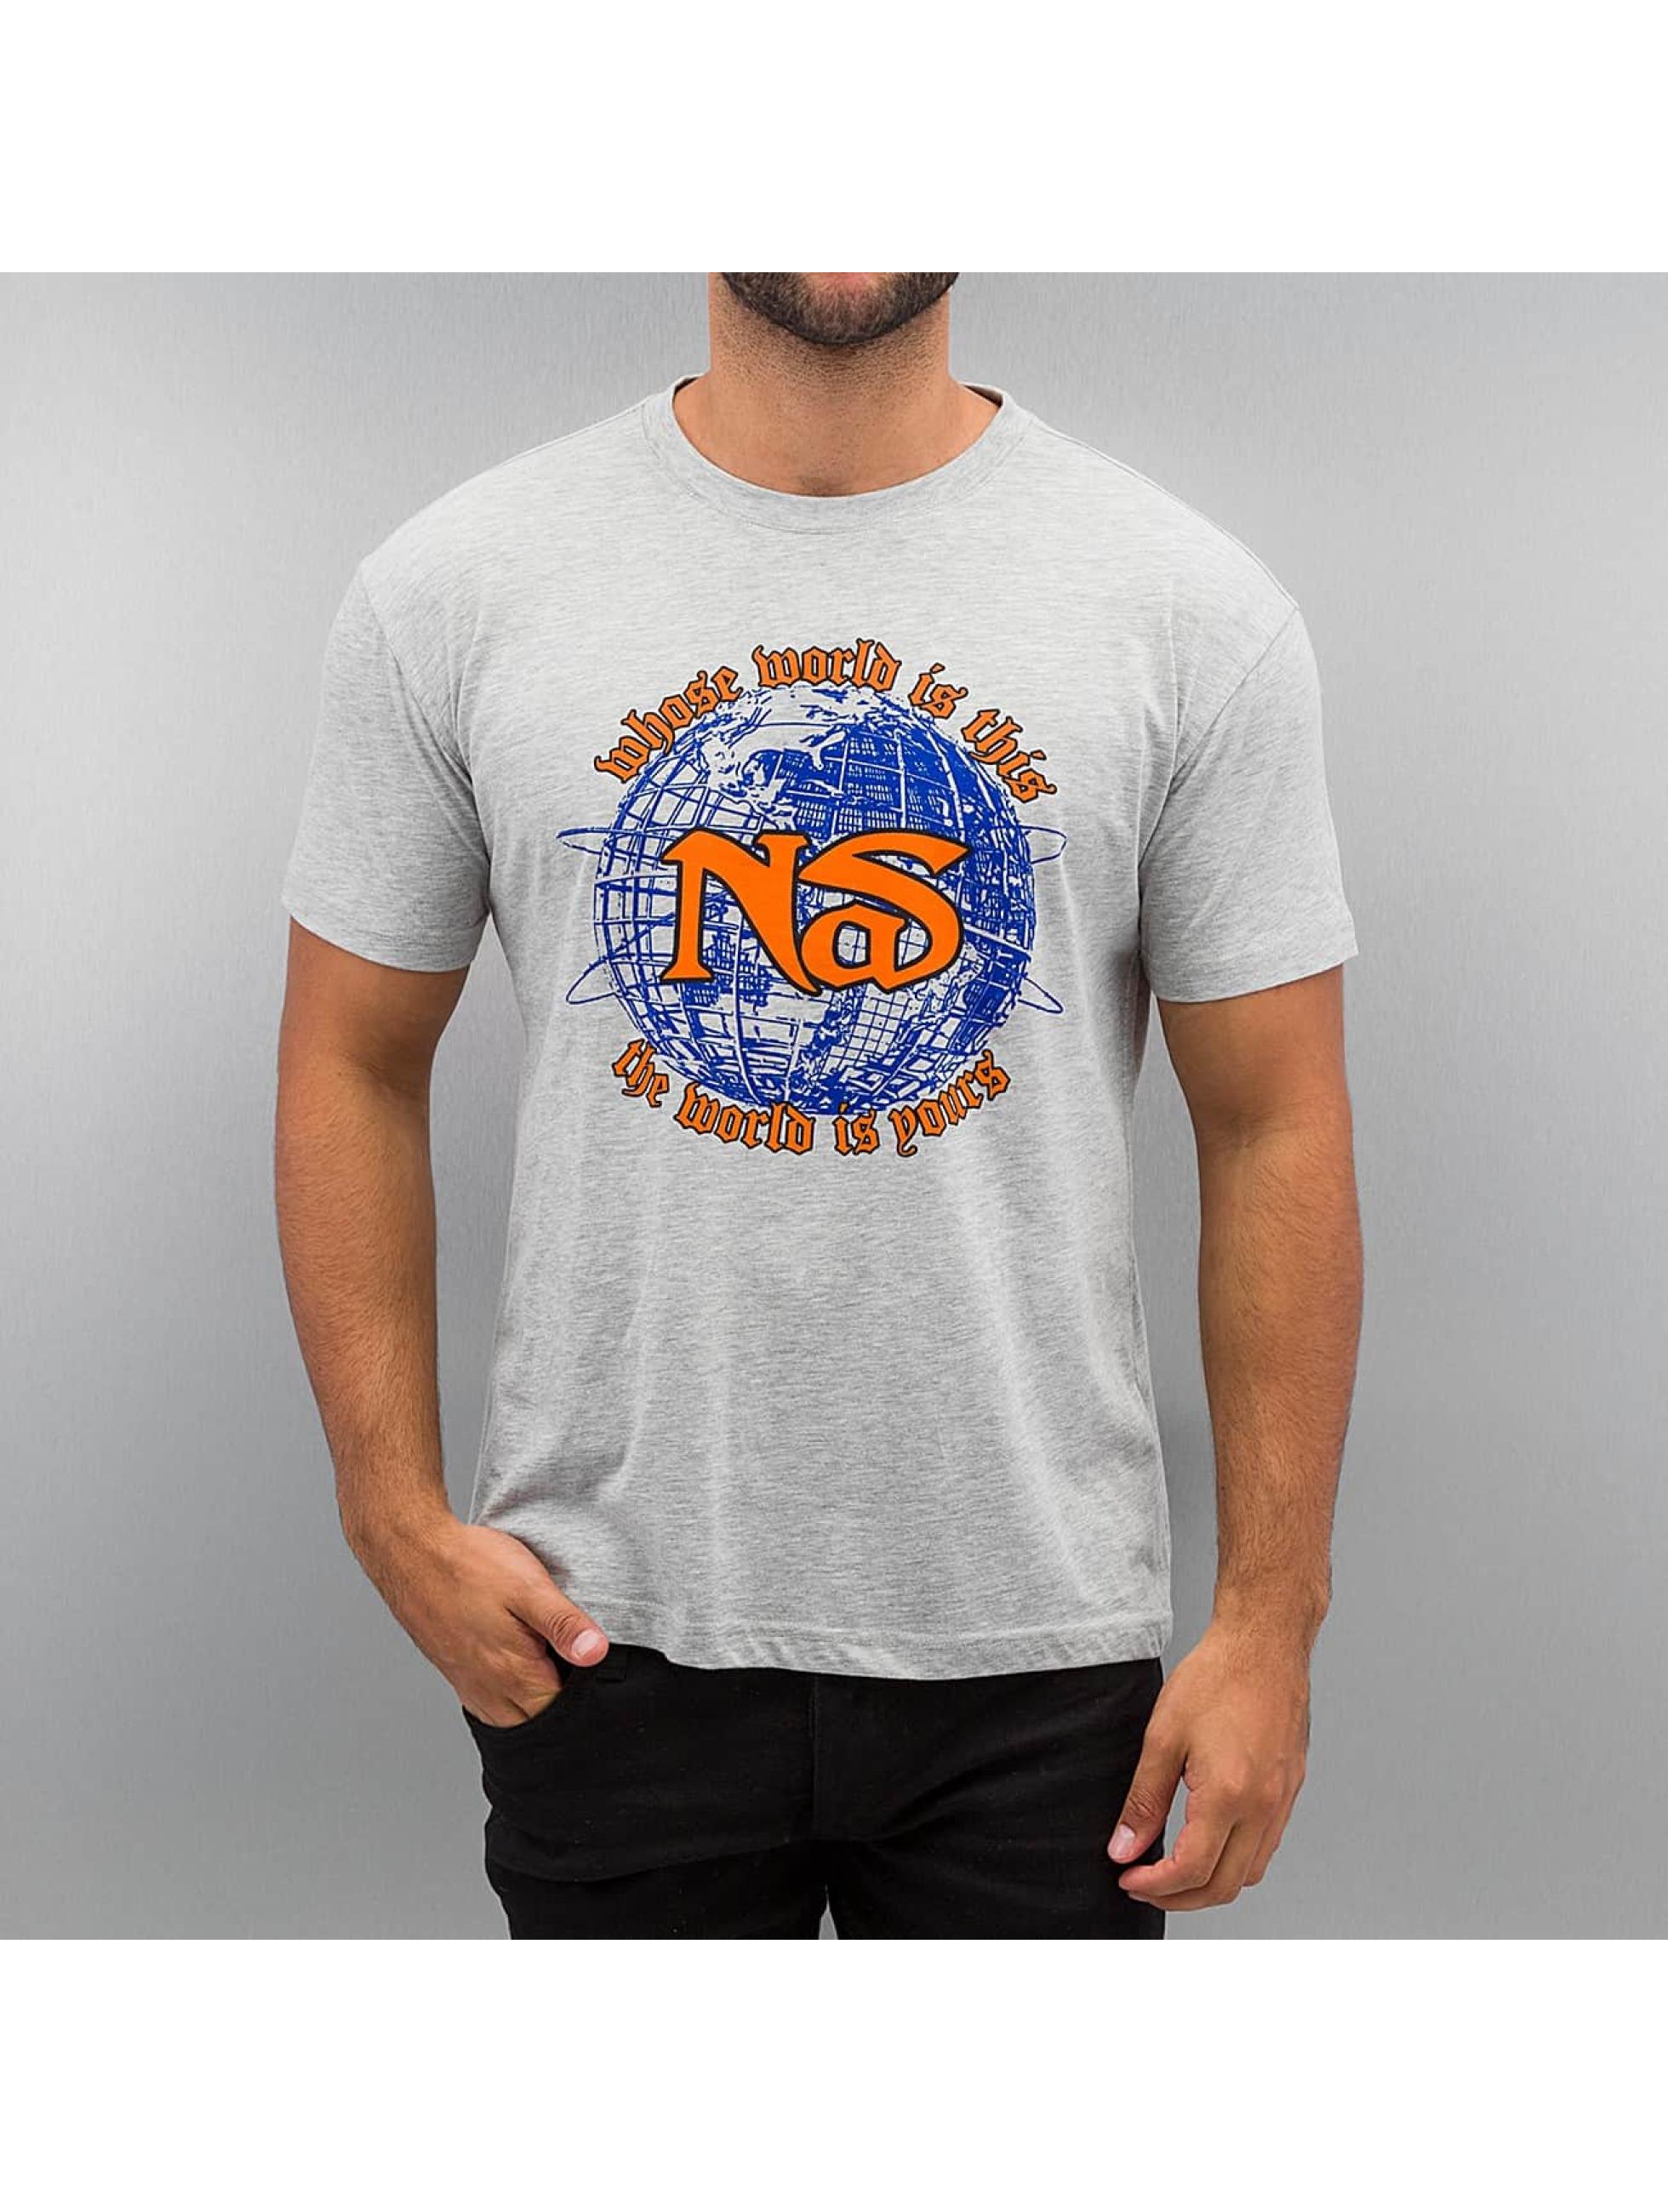 Amplified T-Shirt Nas World grau